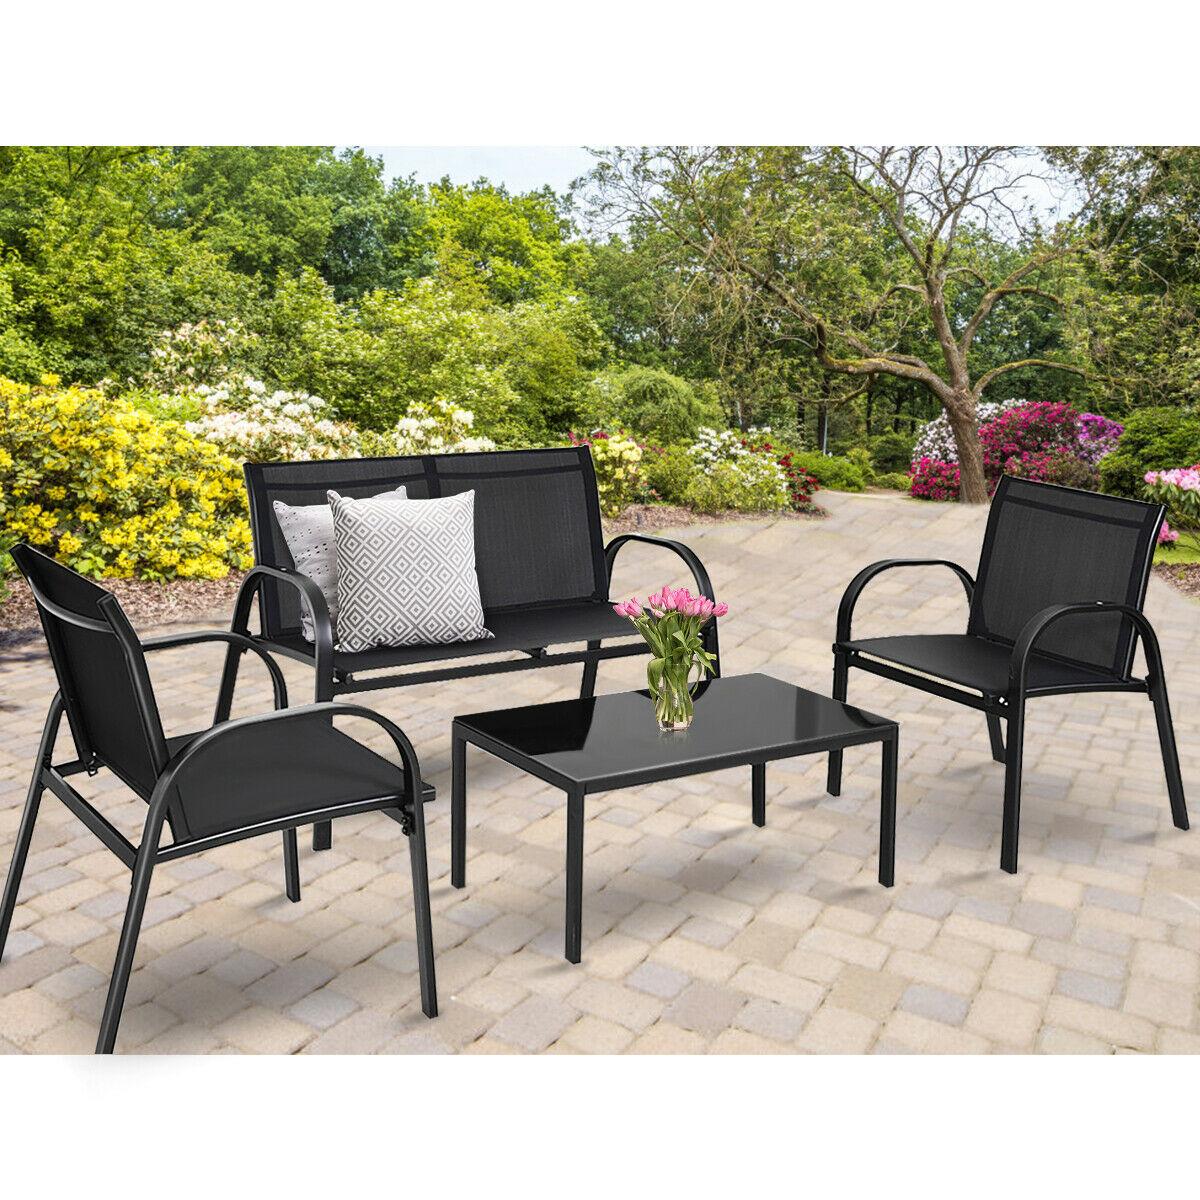 Costway 4 Pcs Patio Furniture Set Sofa Coffee Table Steel Frame Garden Deck Black Walmart for proportions 1200 X 1200